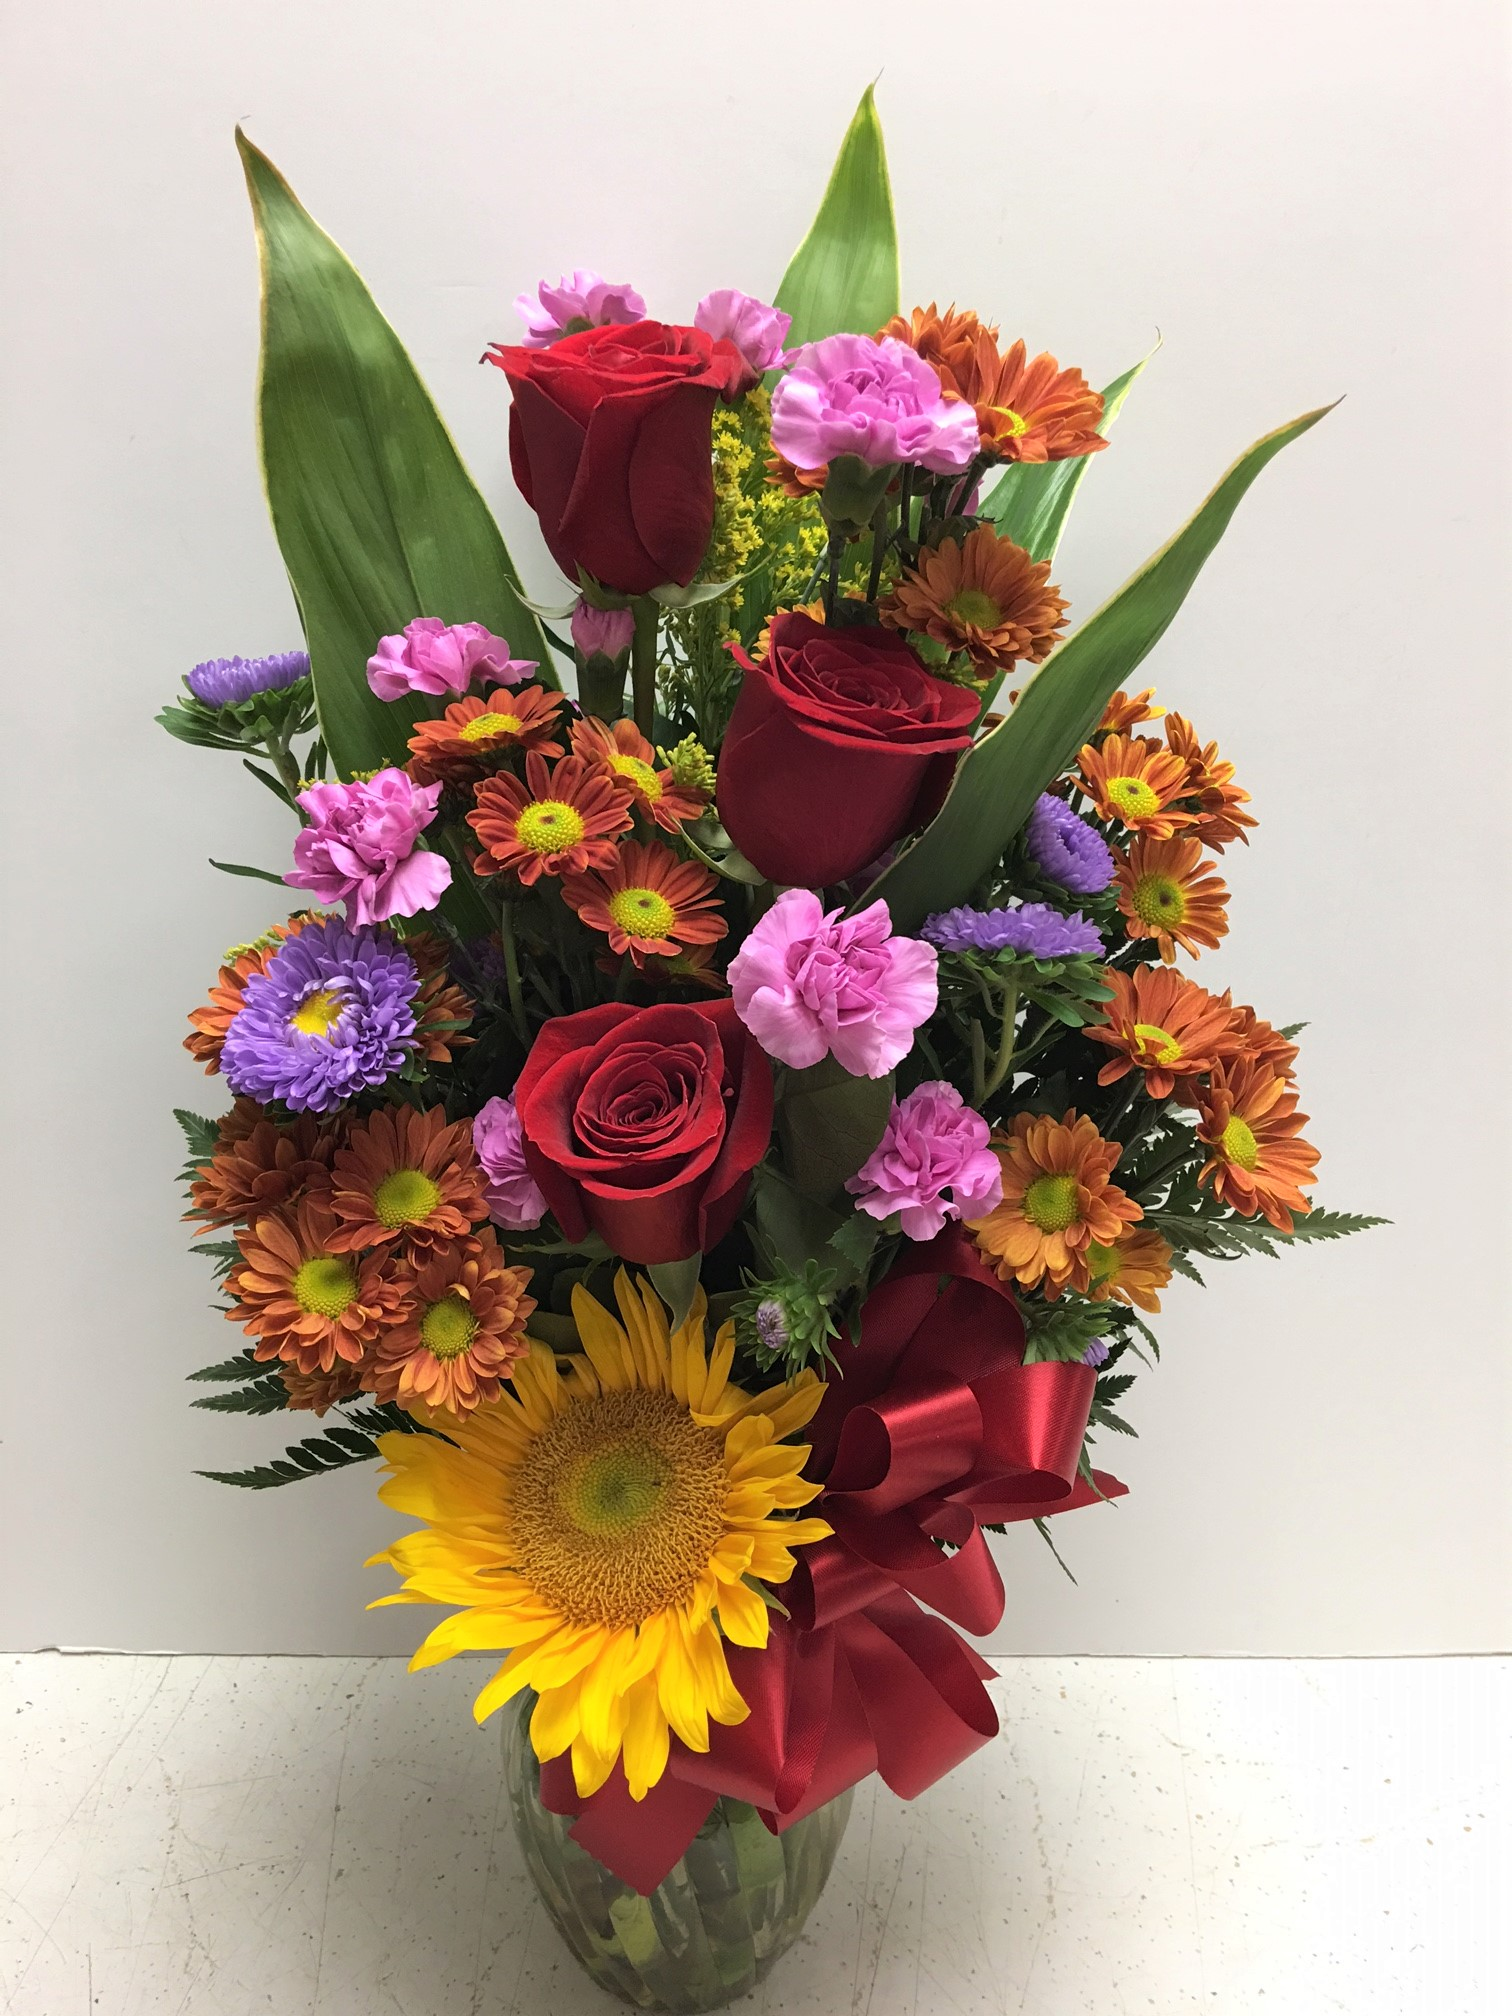 Halloween florist phoenix flower delivery phoenix az 5995 select options wonder of fall izmirmasajfo Choice Image